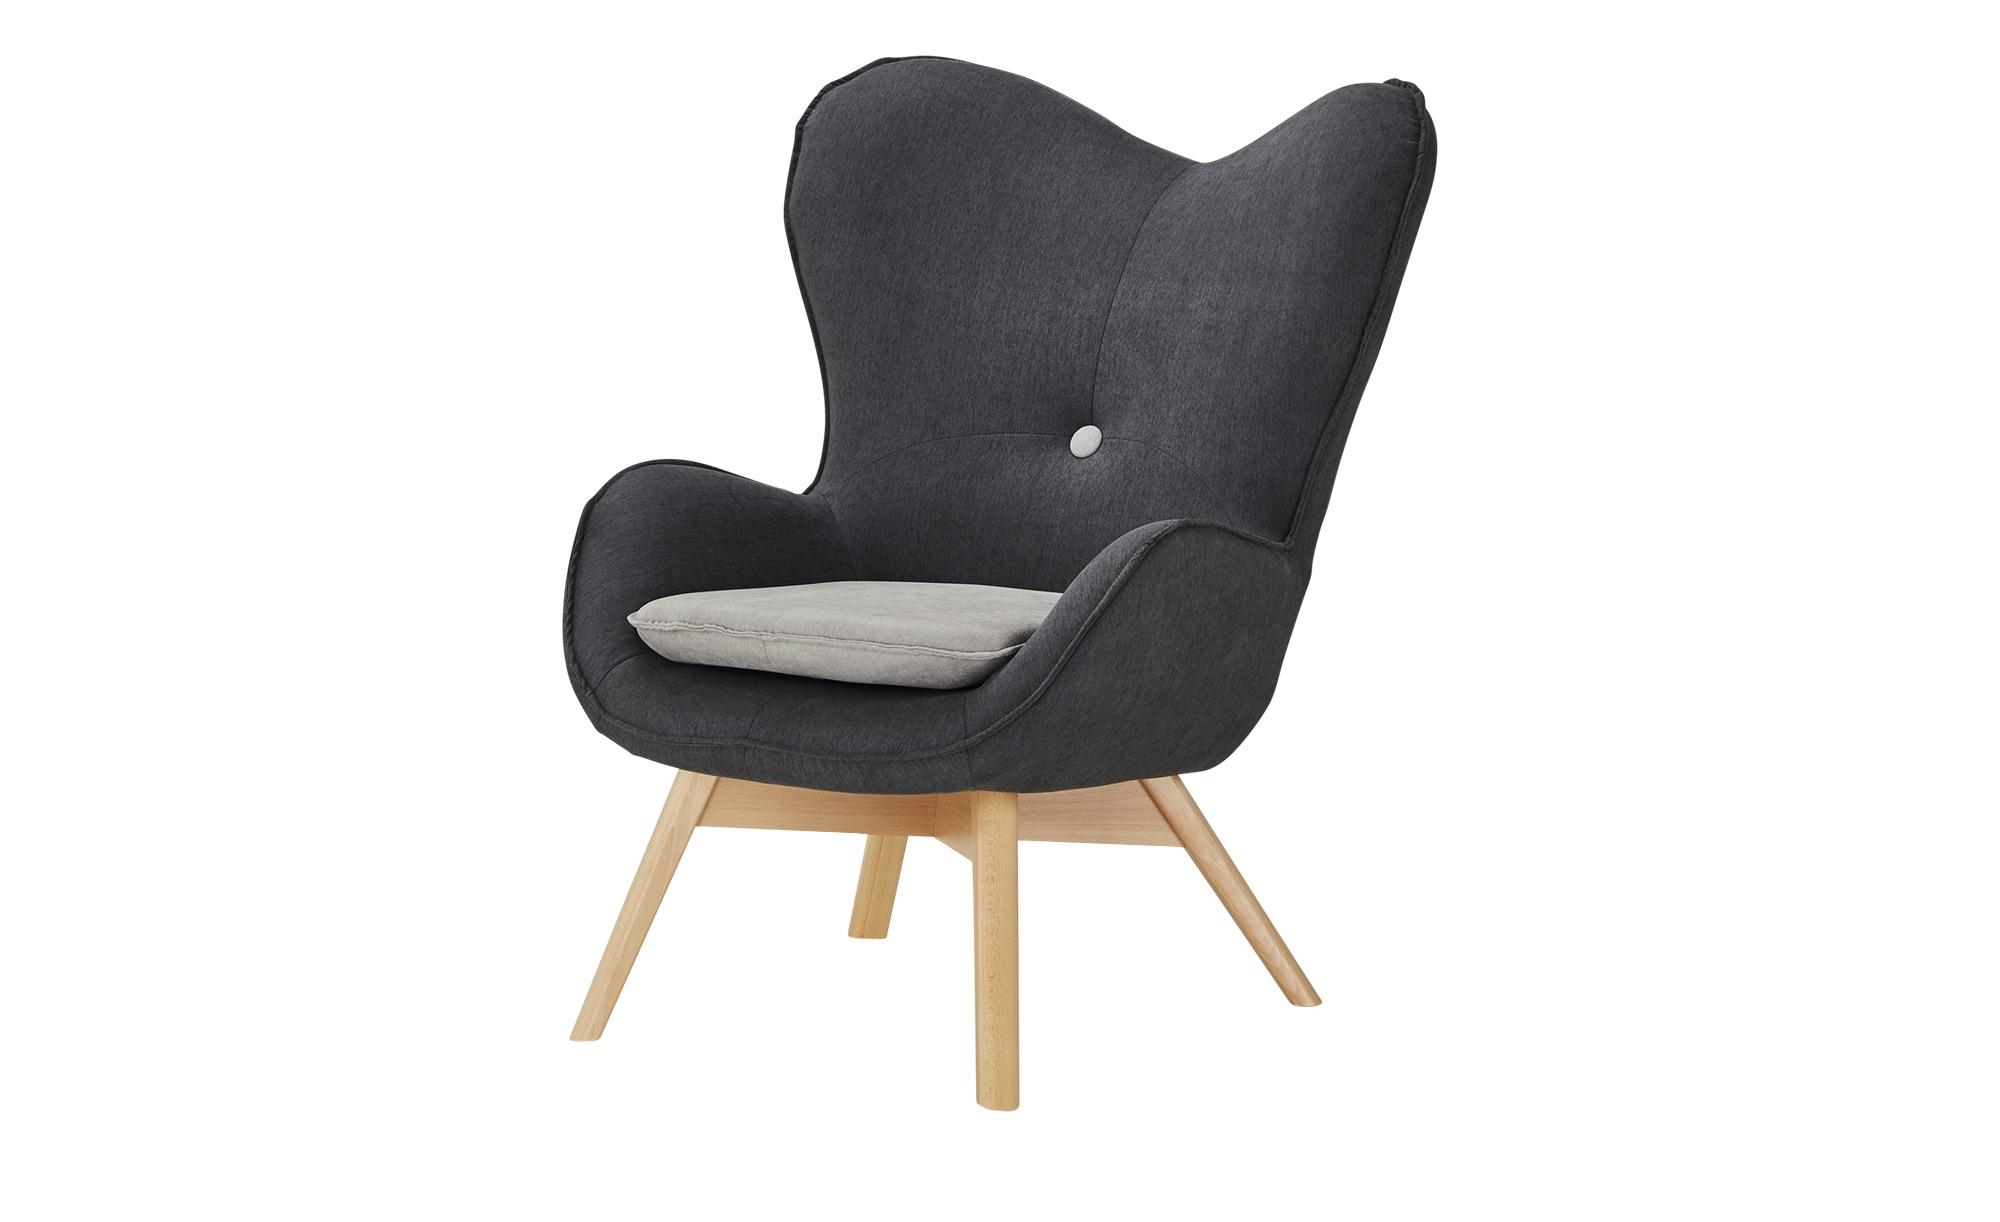 Sessel Maxi Grau Maße Cm B 86 H 100 T 92 Polstermöbel Sessel Ohrensessel Höffner Sessel Ohrensessel Xxl Sessel